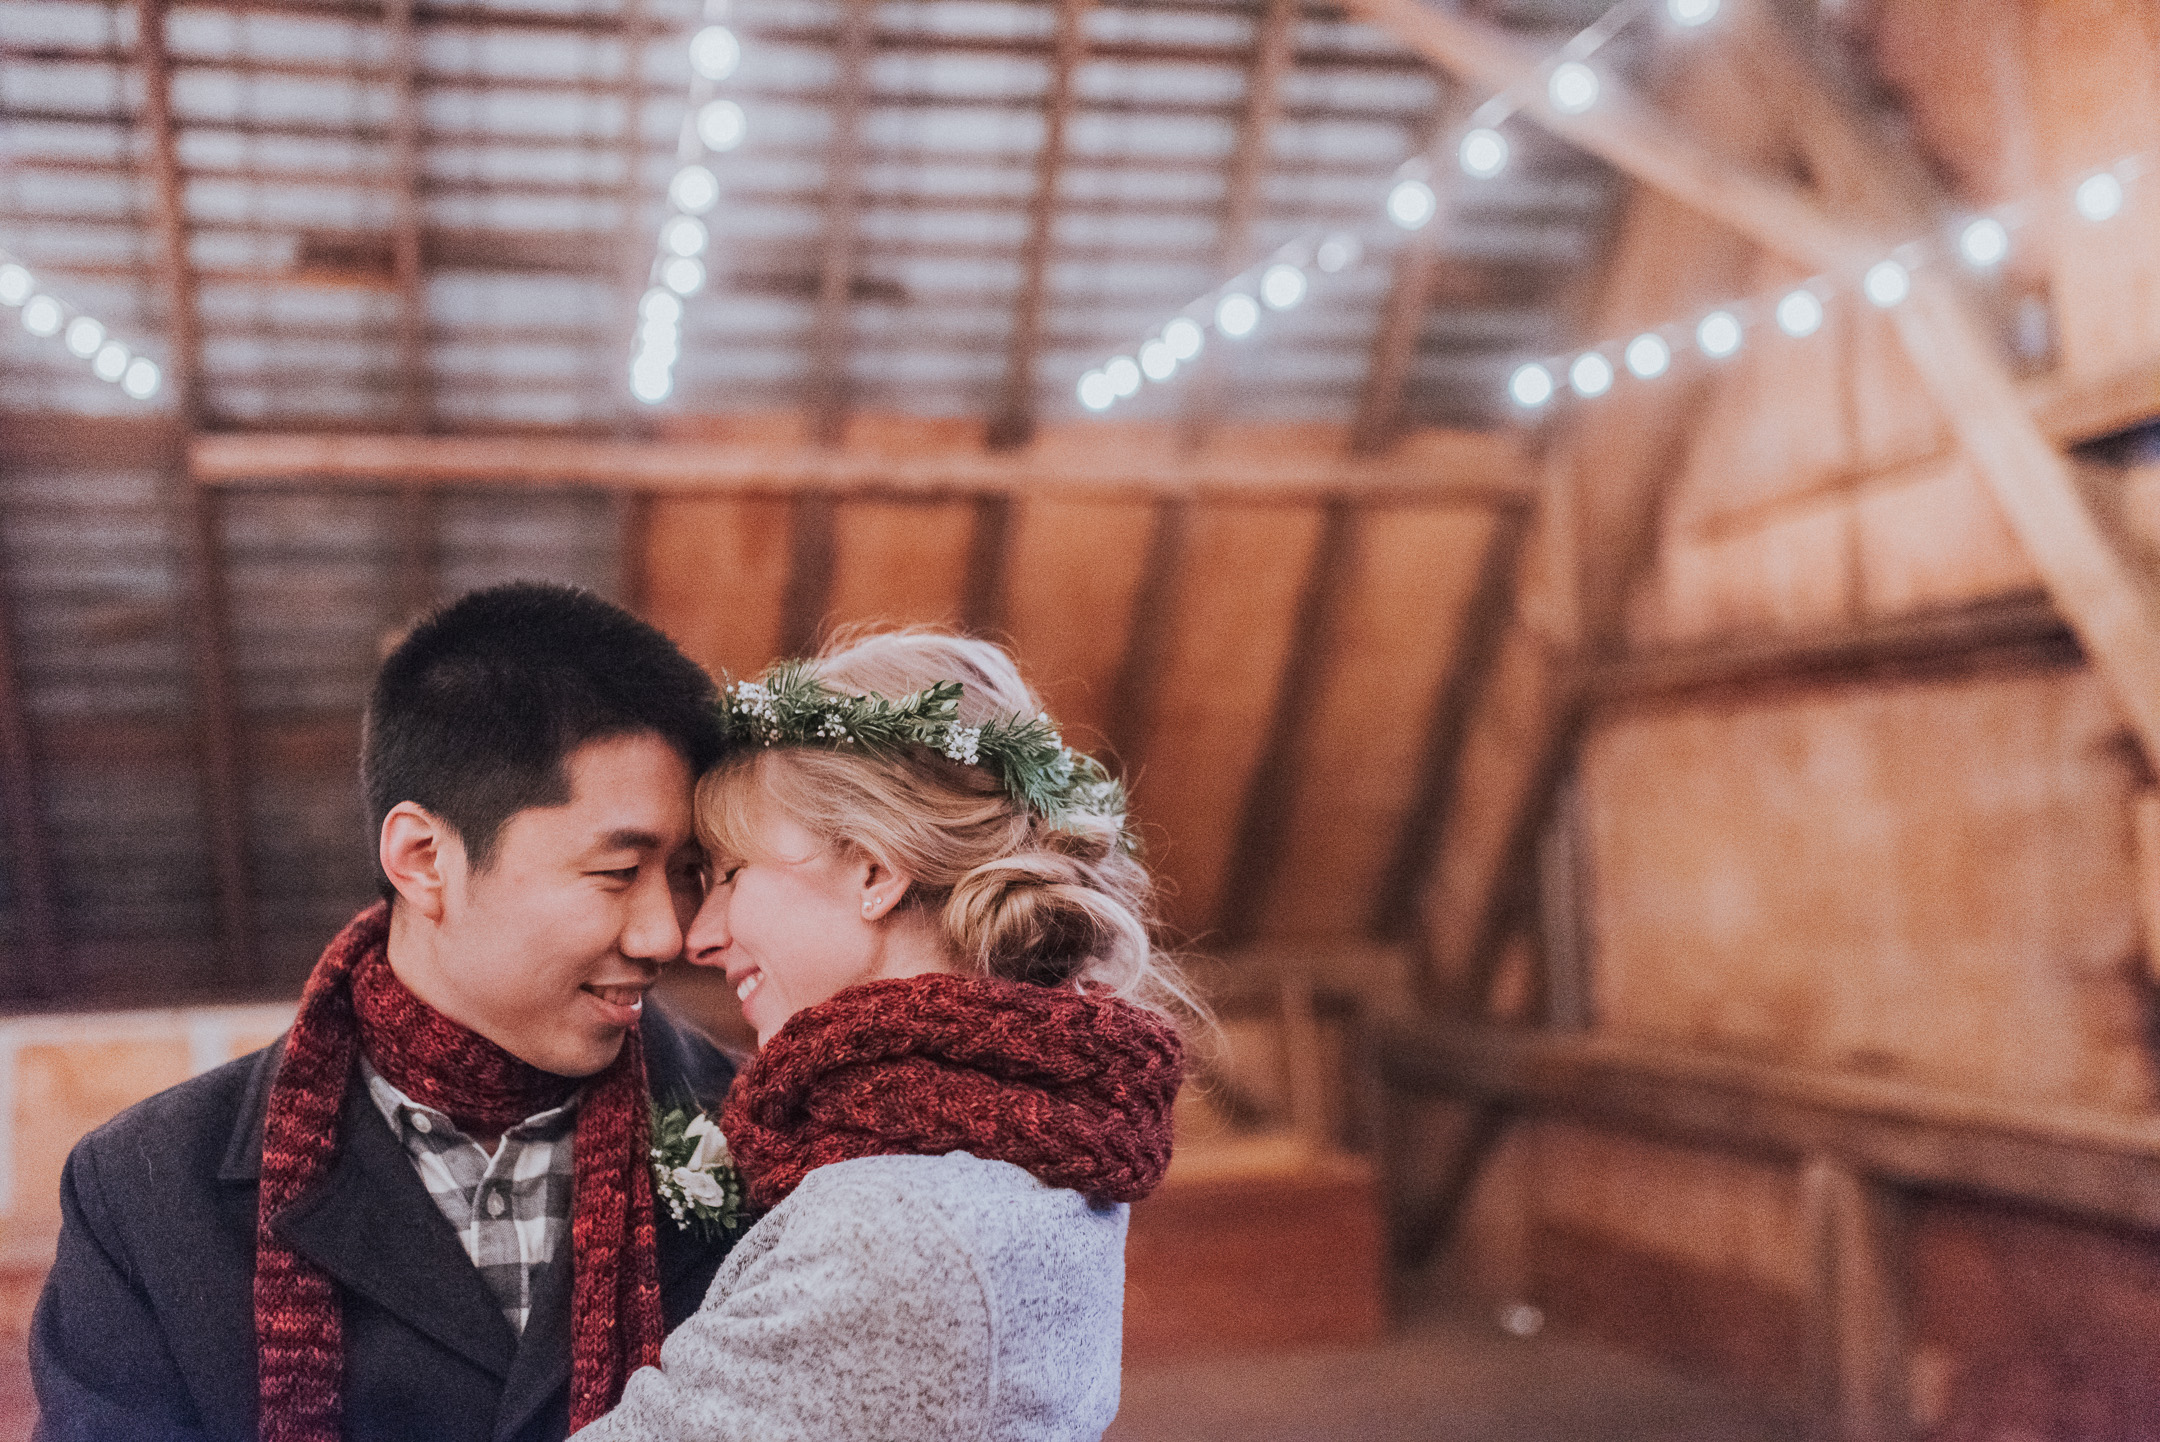 east coast wedding photographer (53 of 58).jpg